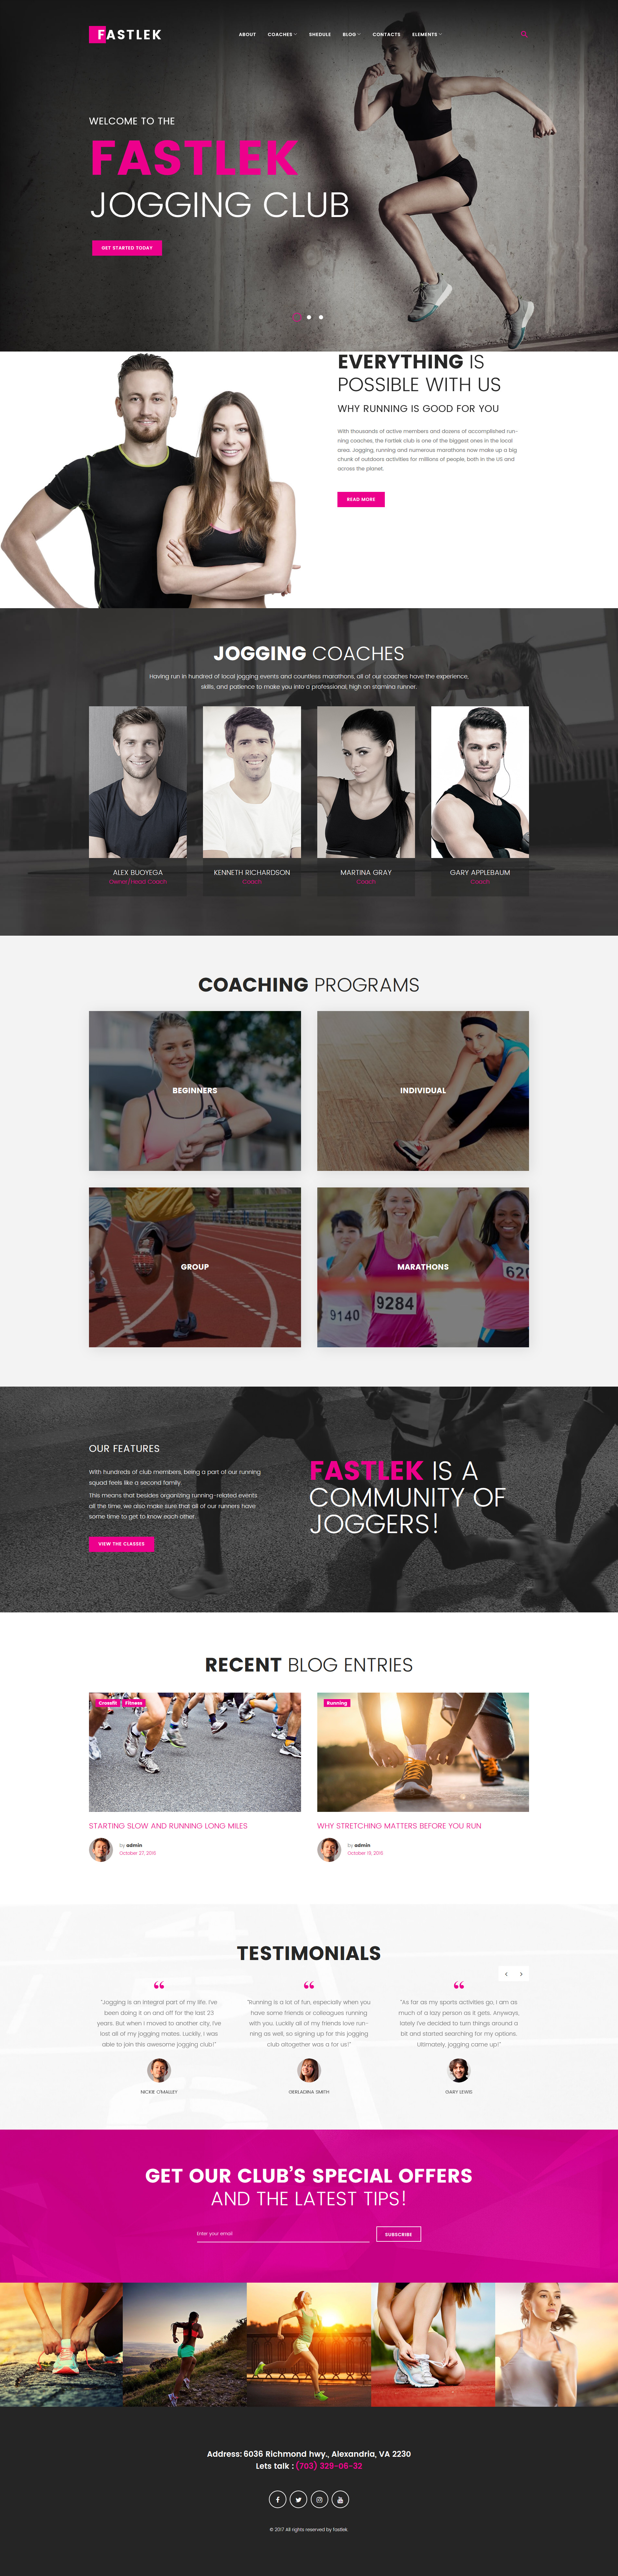 """Fastlek - Running Club & Coaching"" - адаптивний WordPress шаблон №63582"